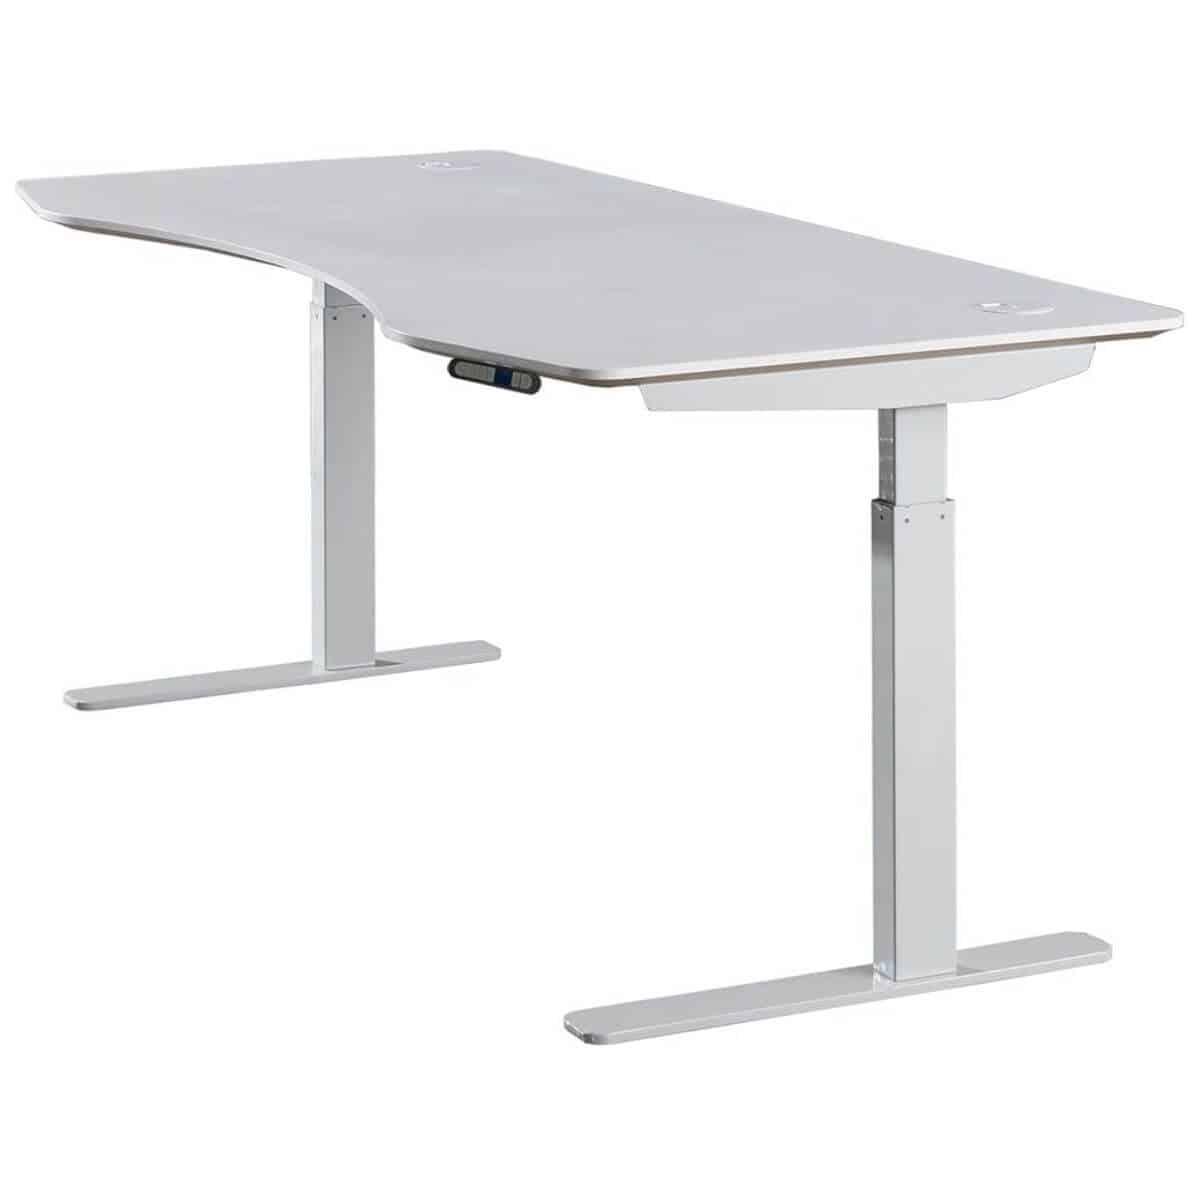 White adjustable height standing desk.